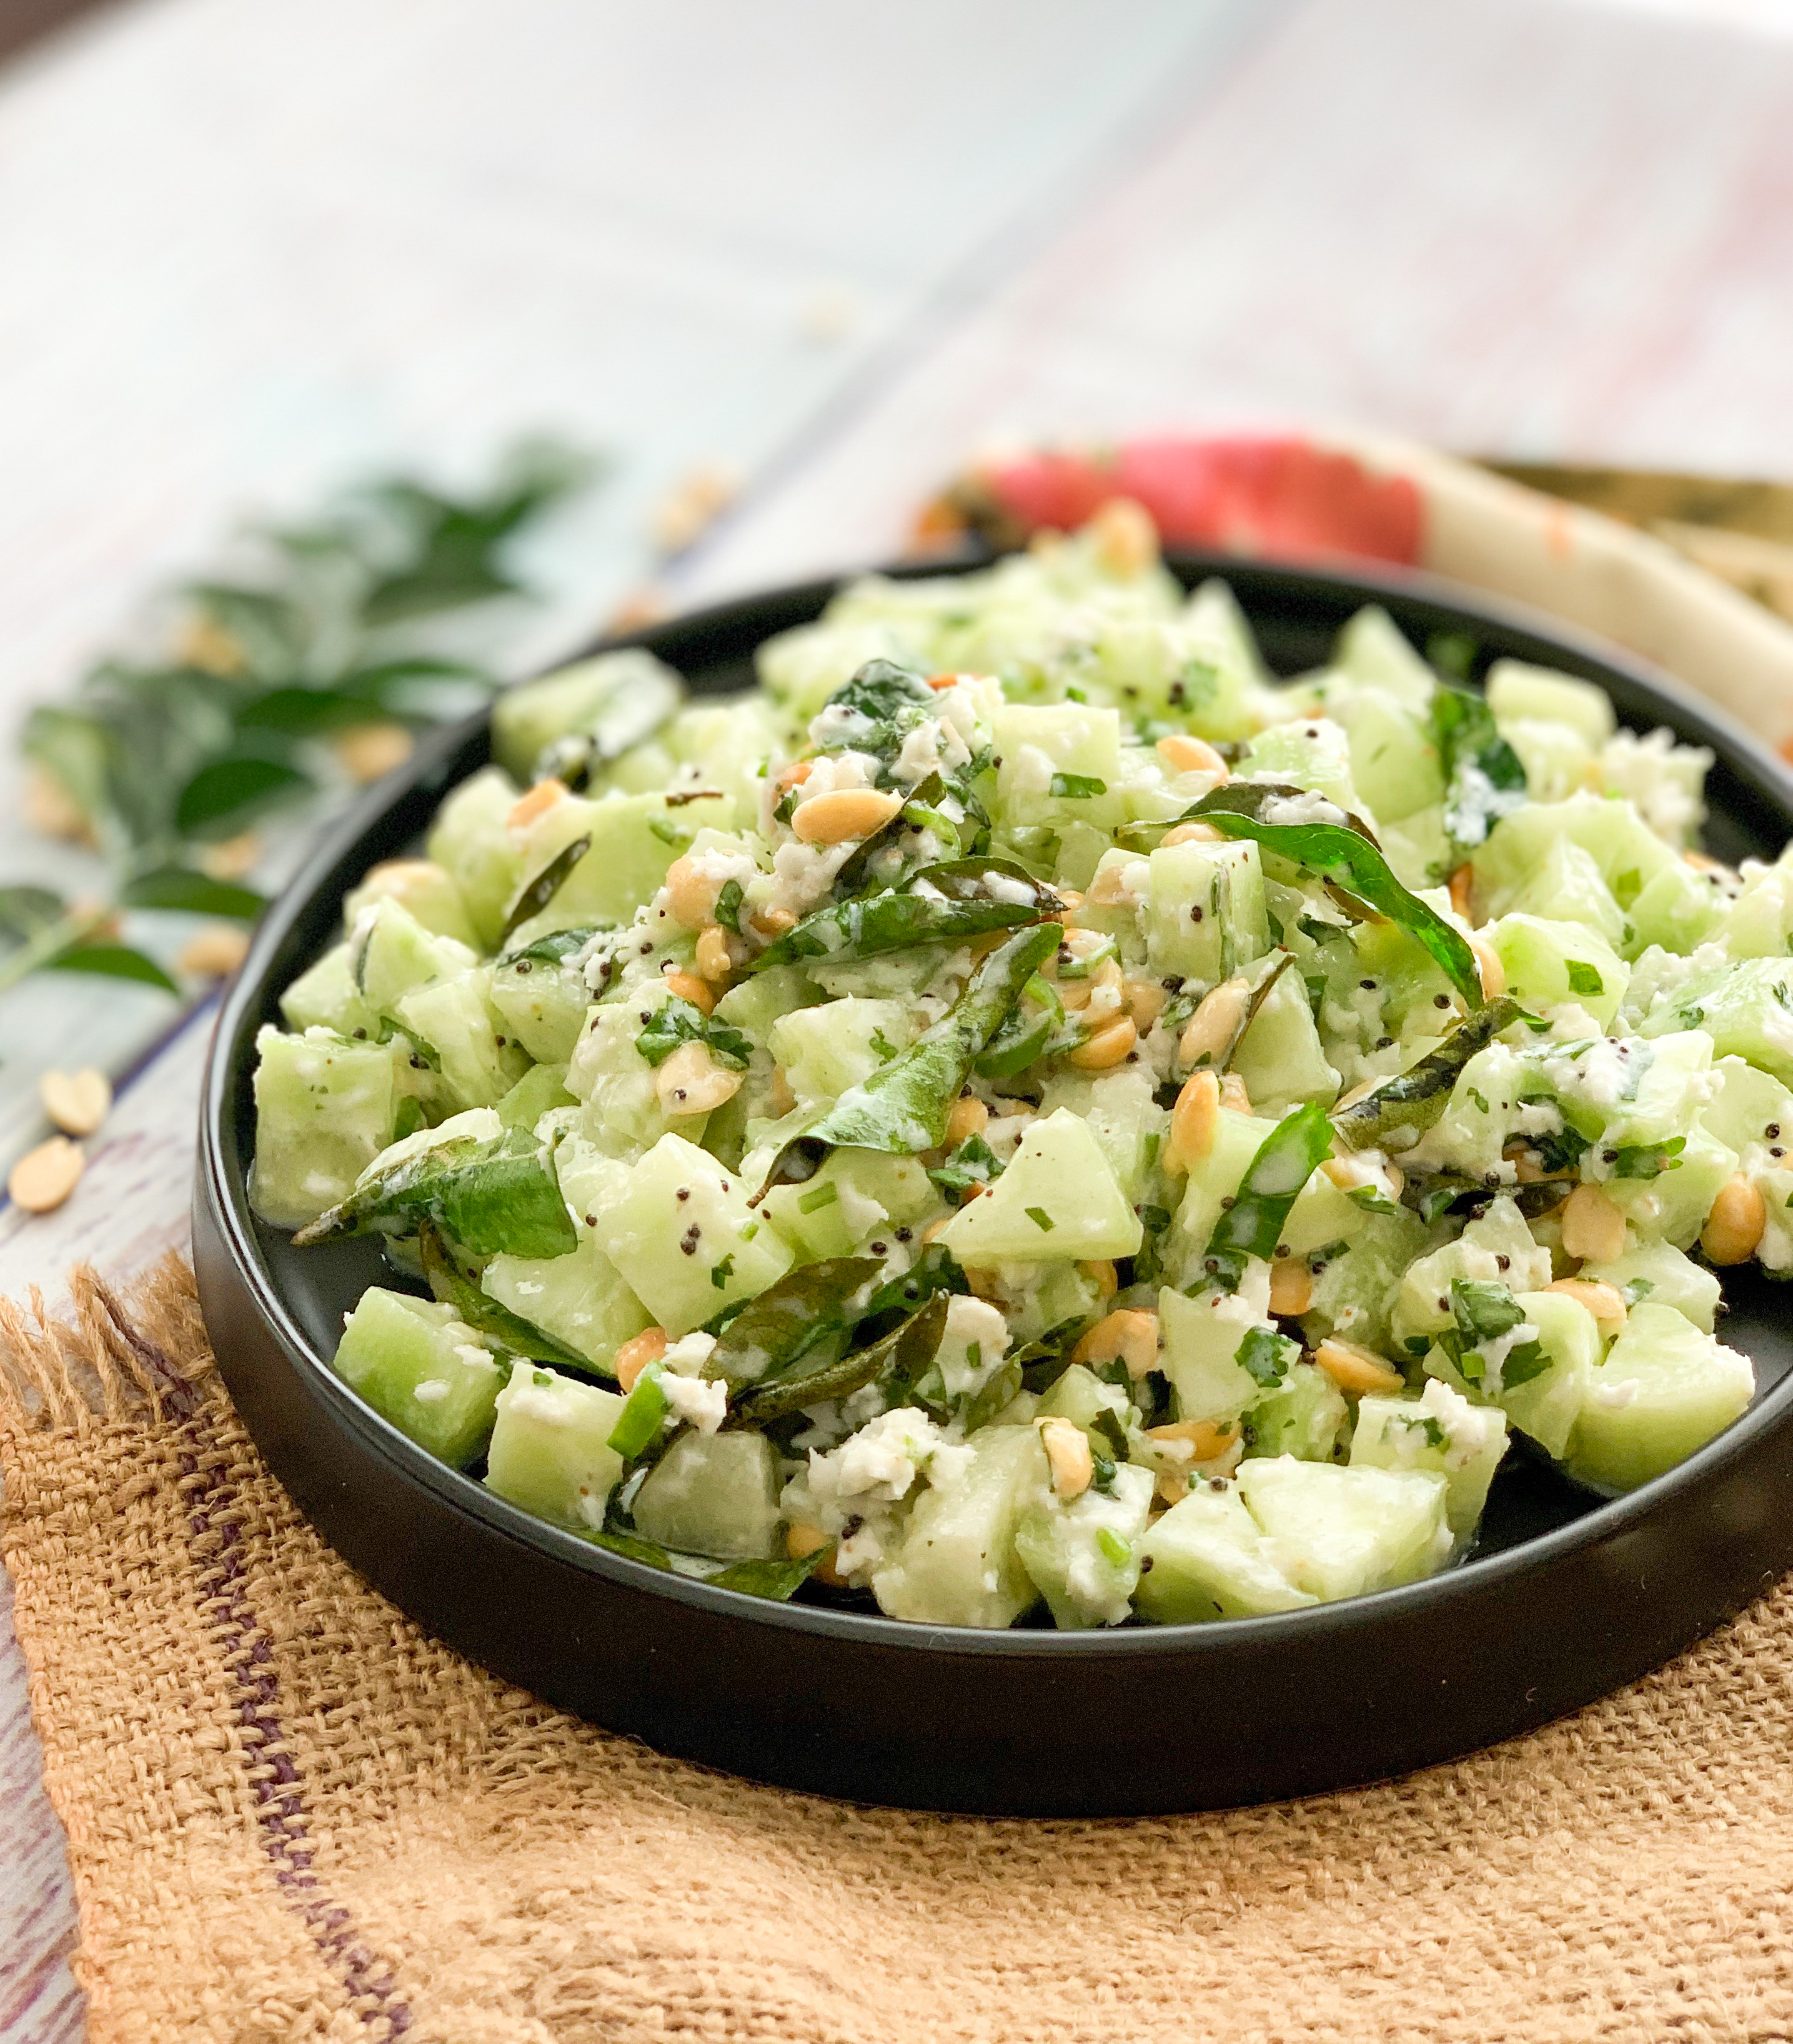 Khamang Kakdi – An Ayurvedic Salad For Your Everyday Meals